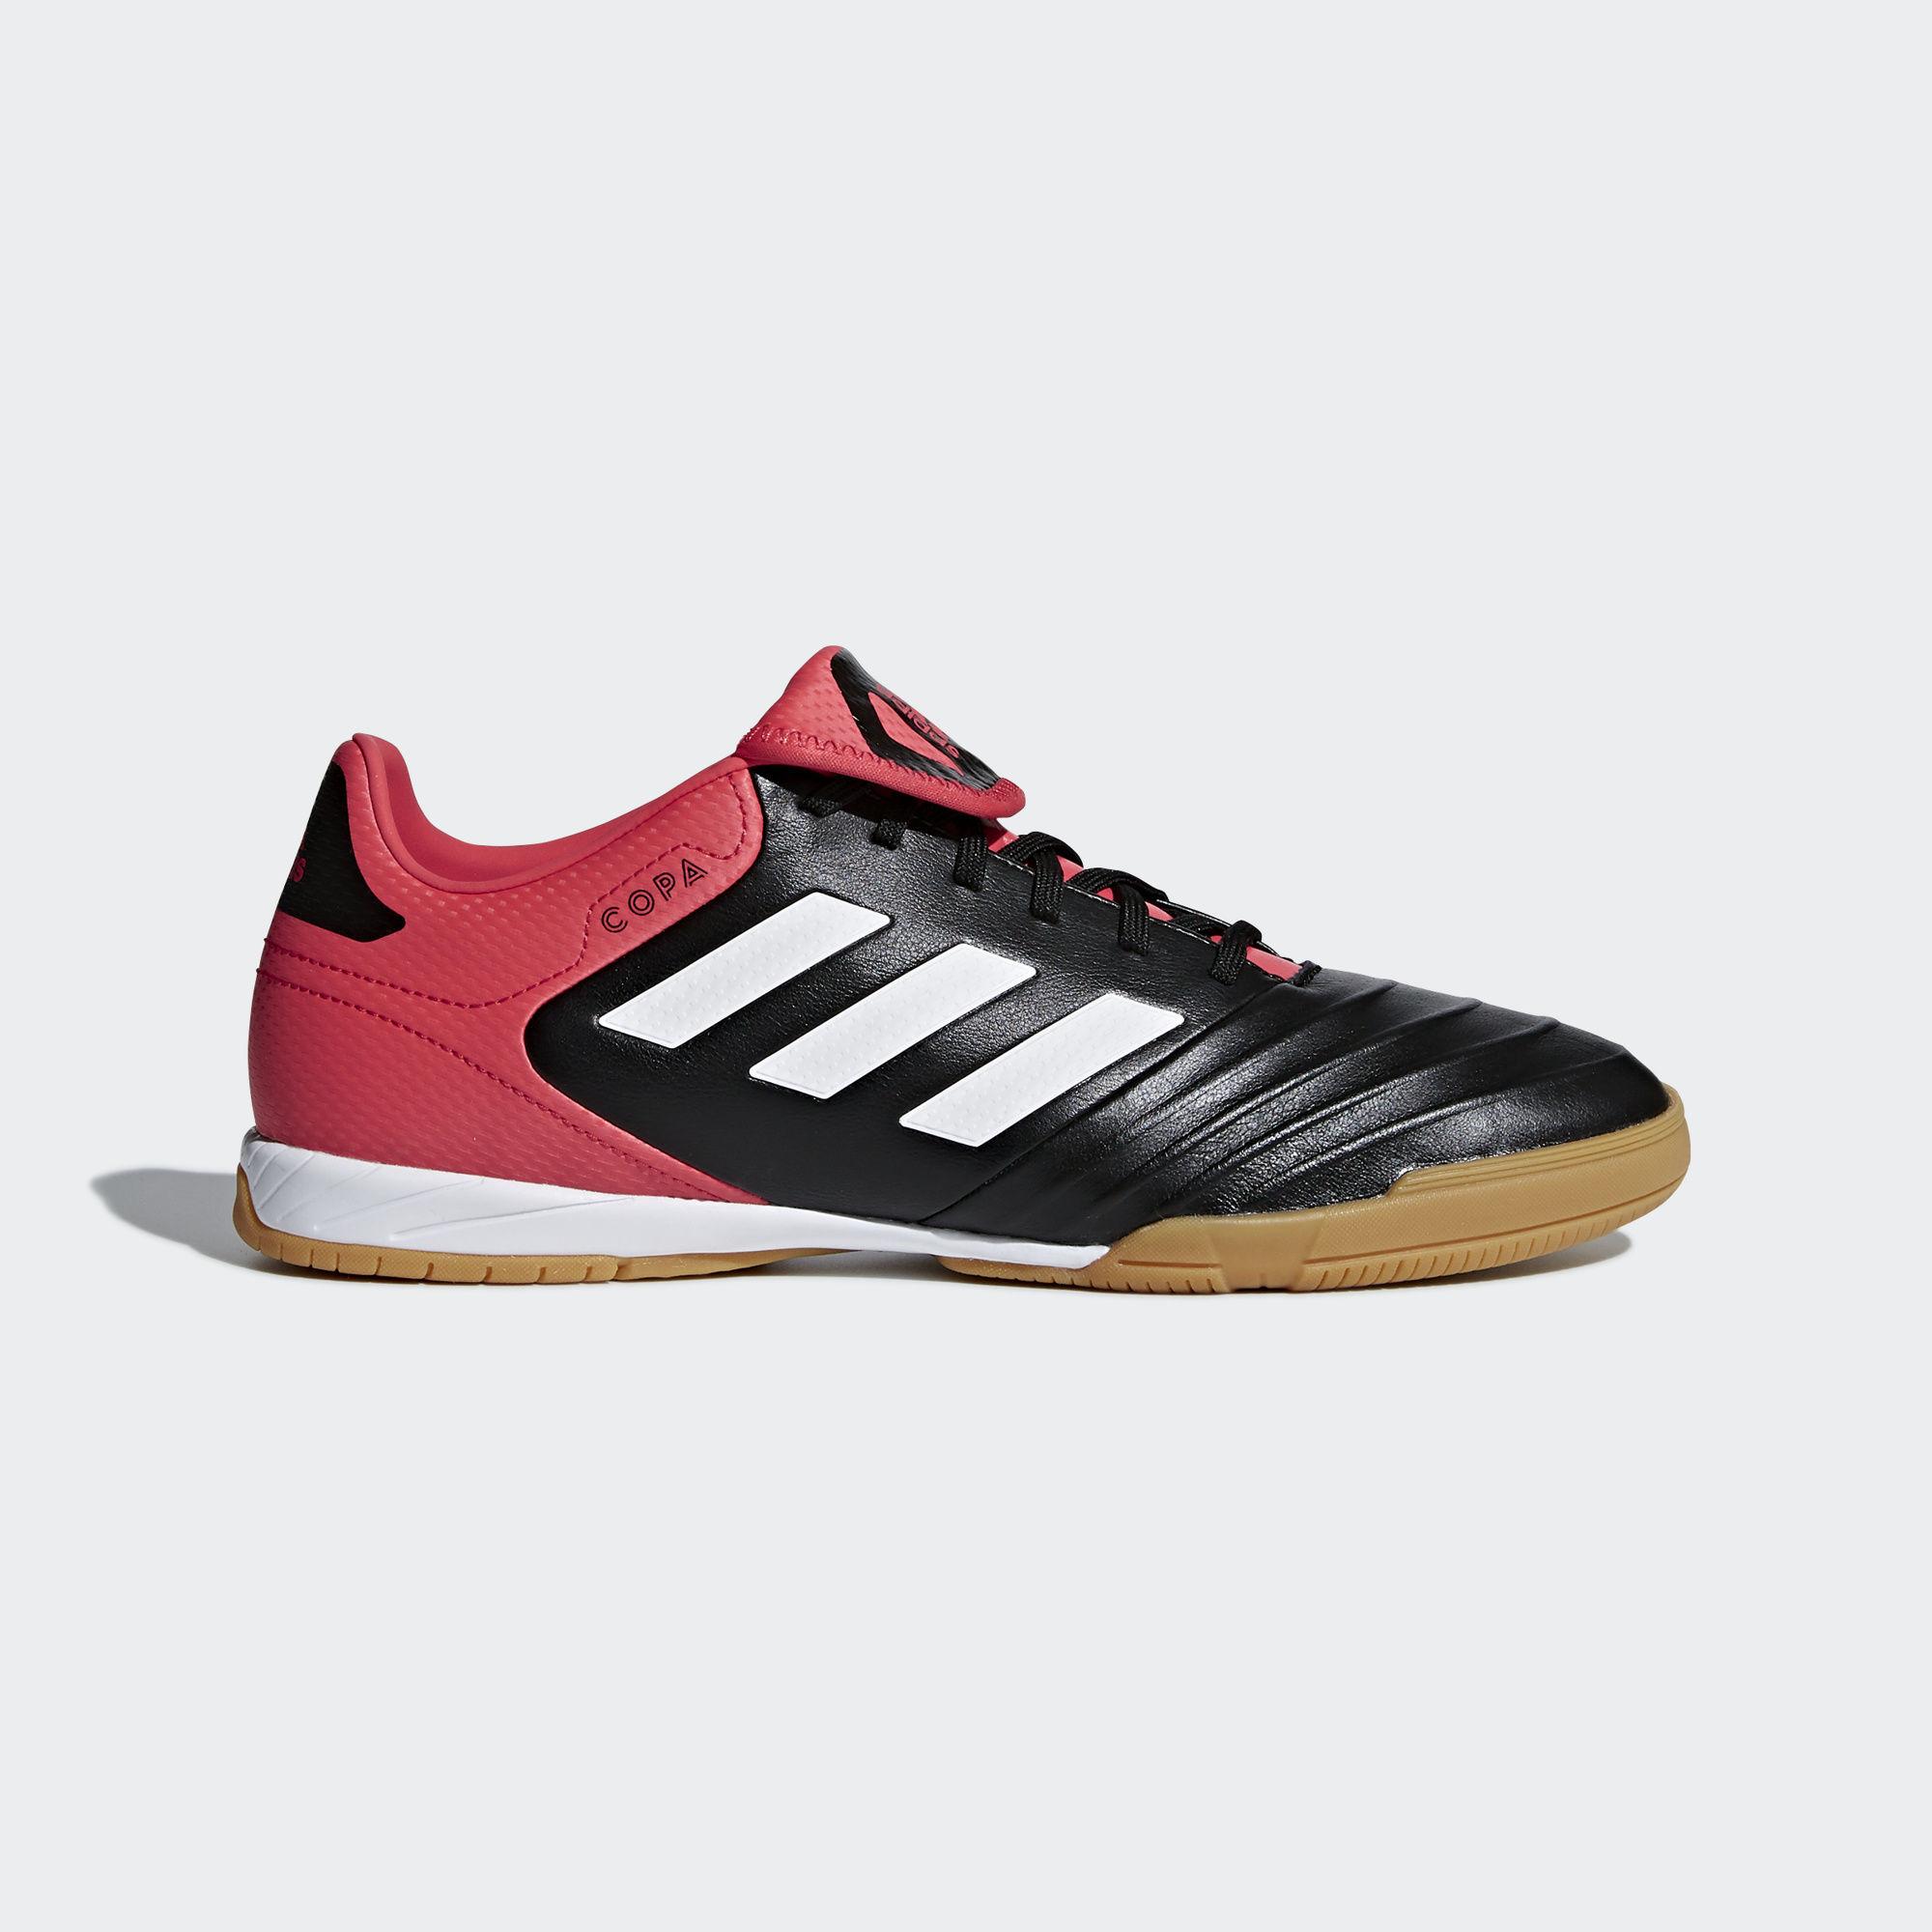 Copa Tango 18.3 IN M CP9017 Adidas